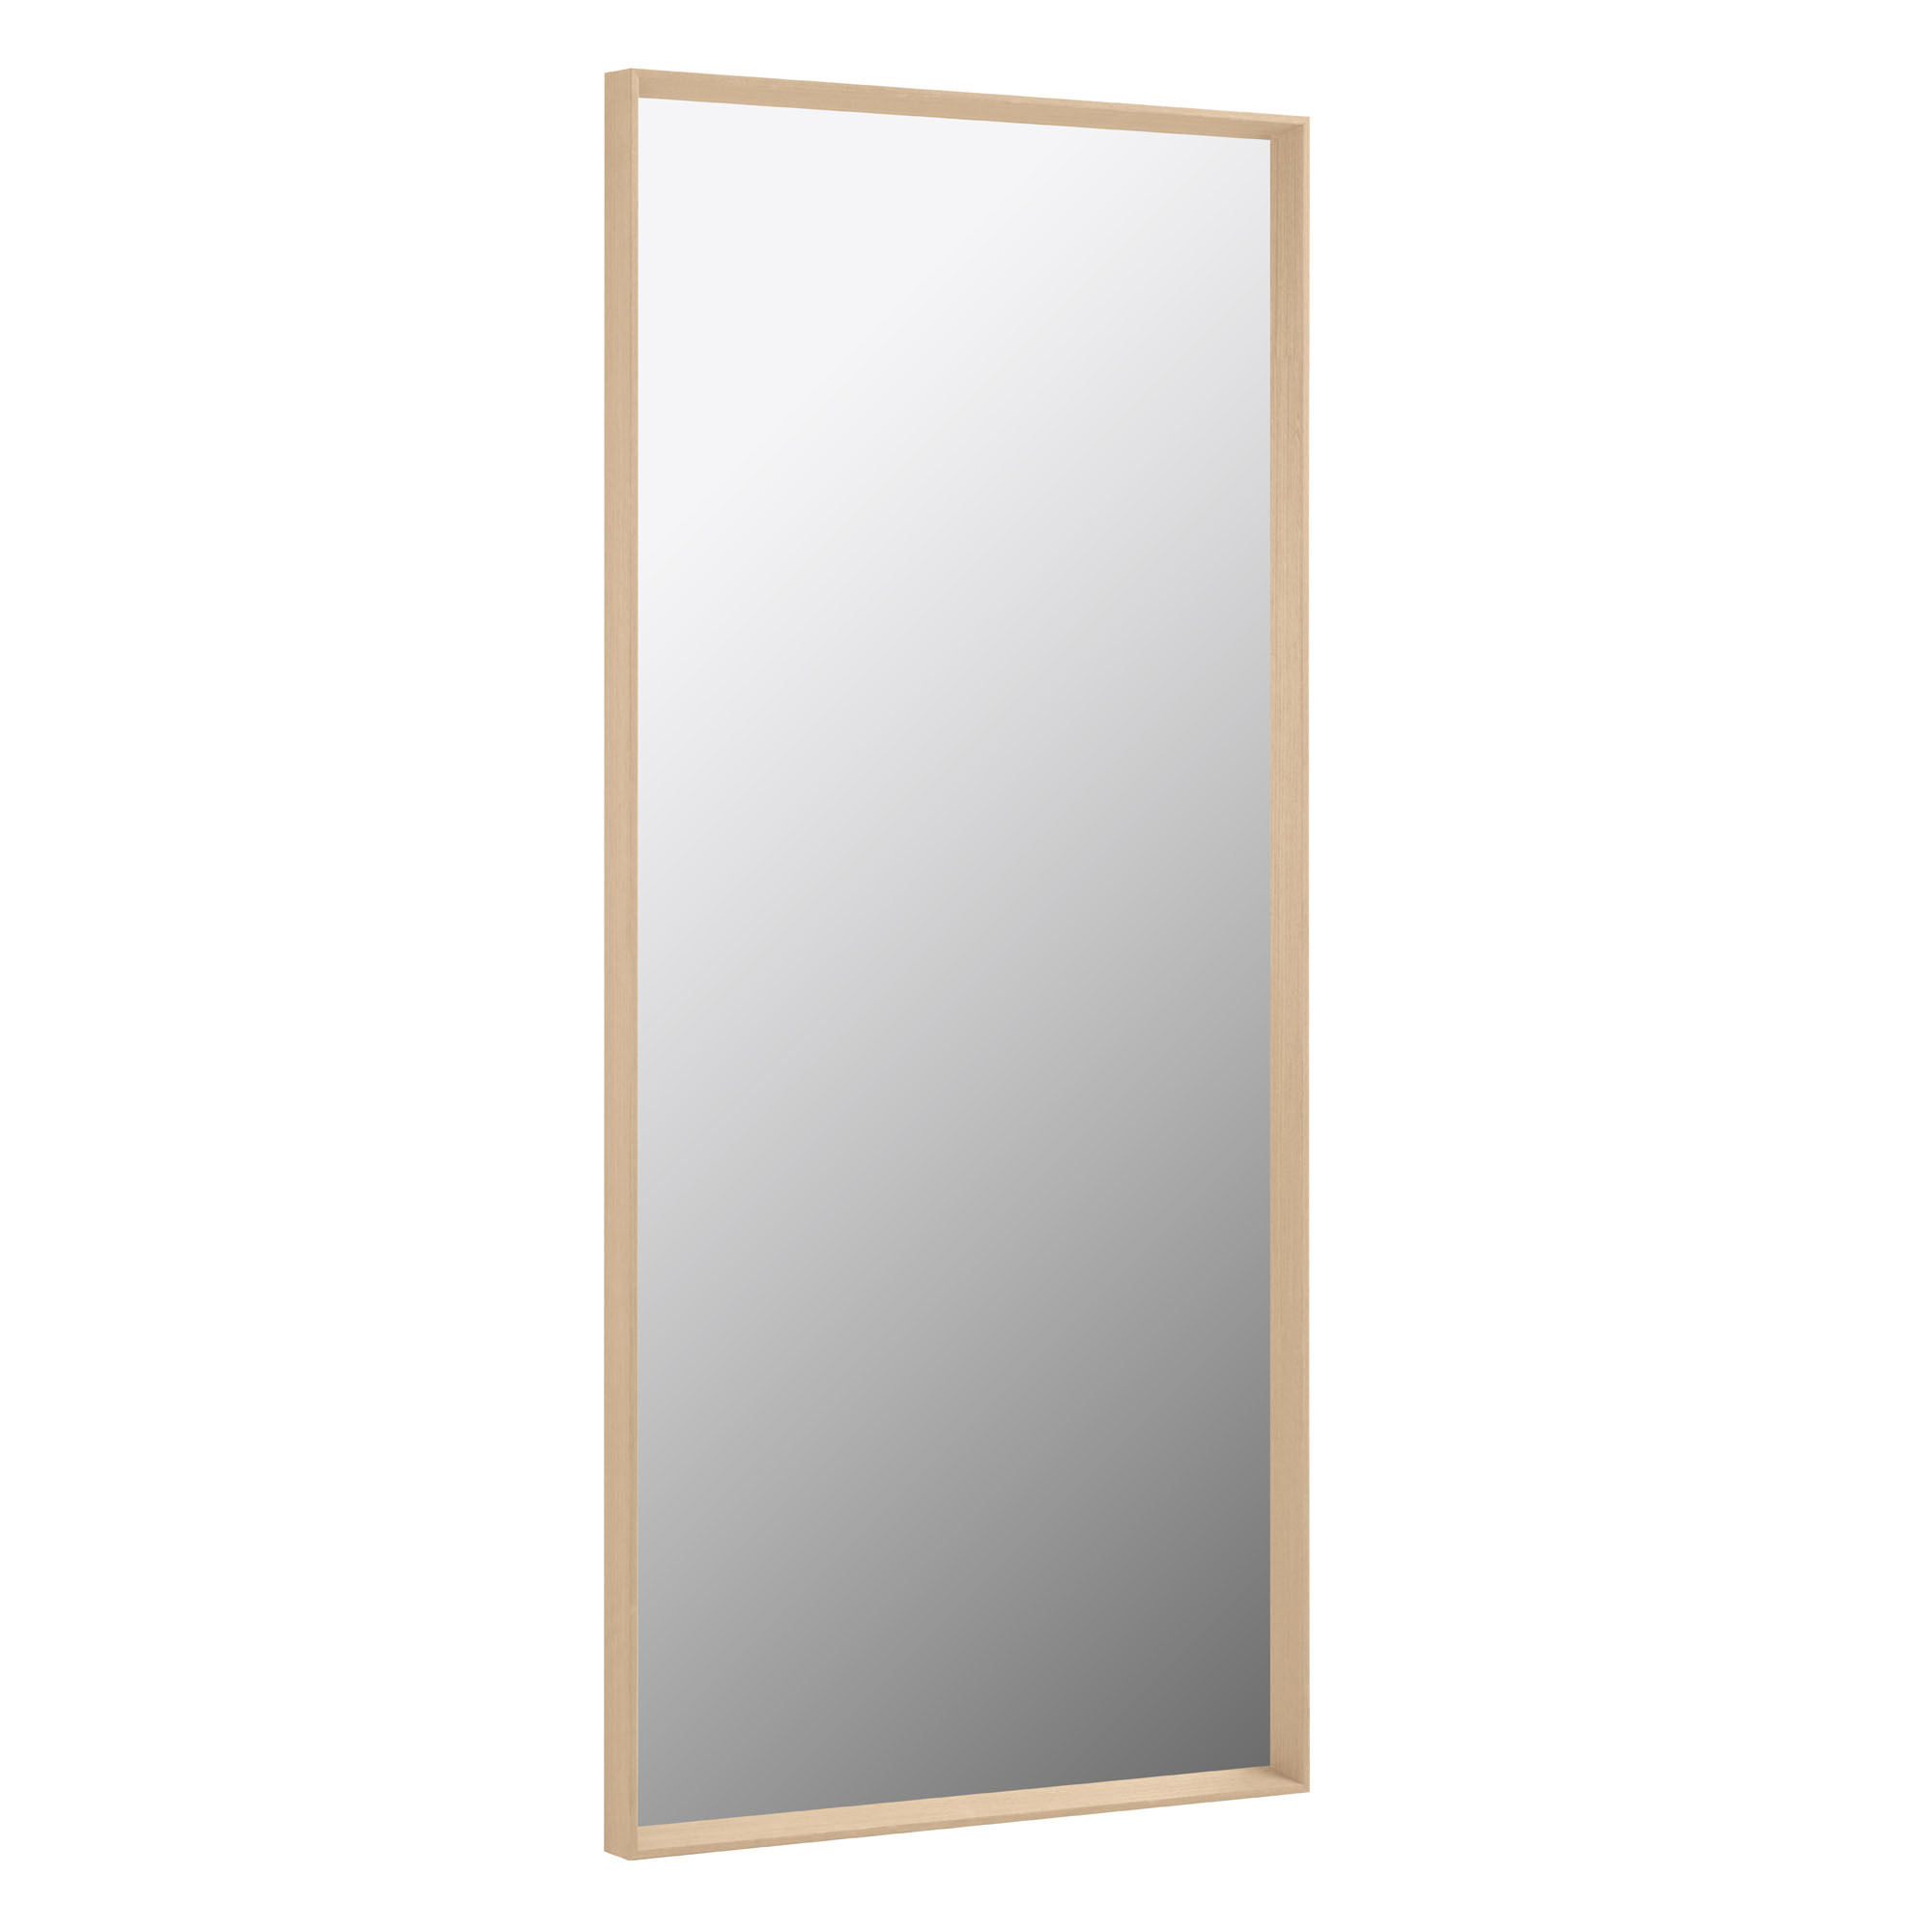 Kave home - miroir yvaine 80 x 180 cm finition...